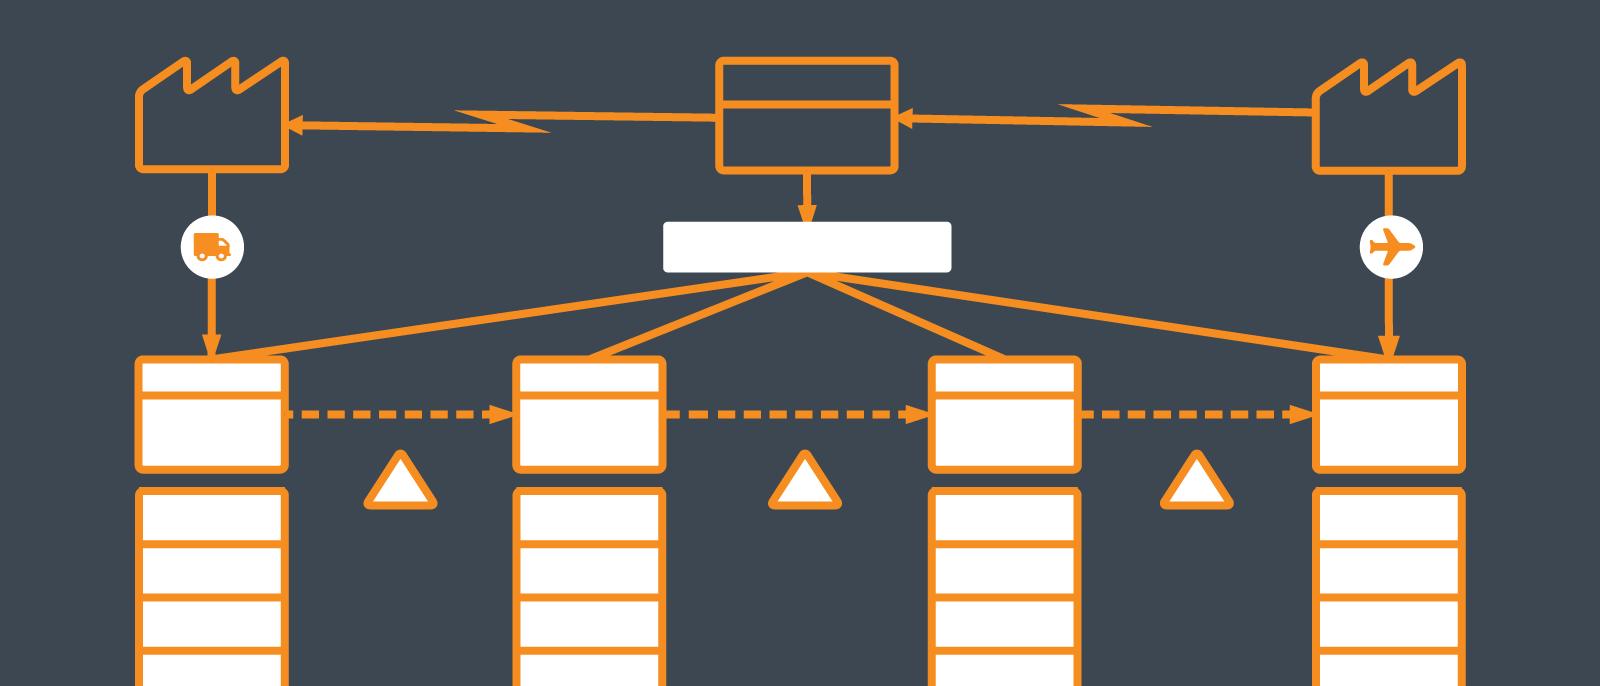 Proces Flow Diagram All Waste Stream